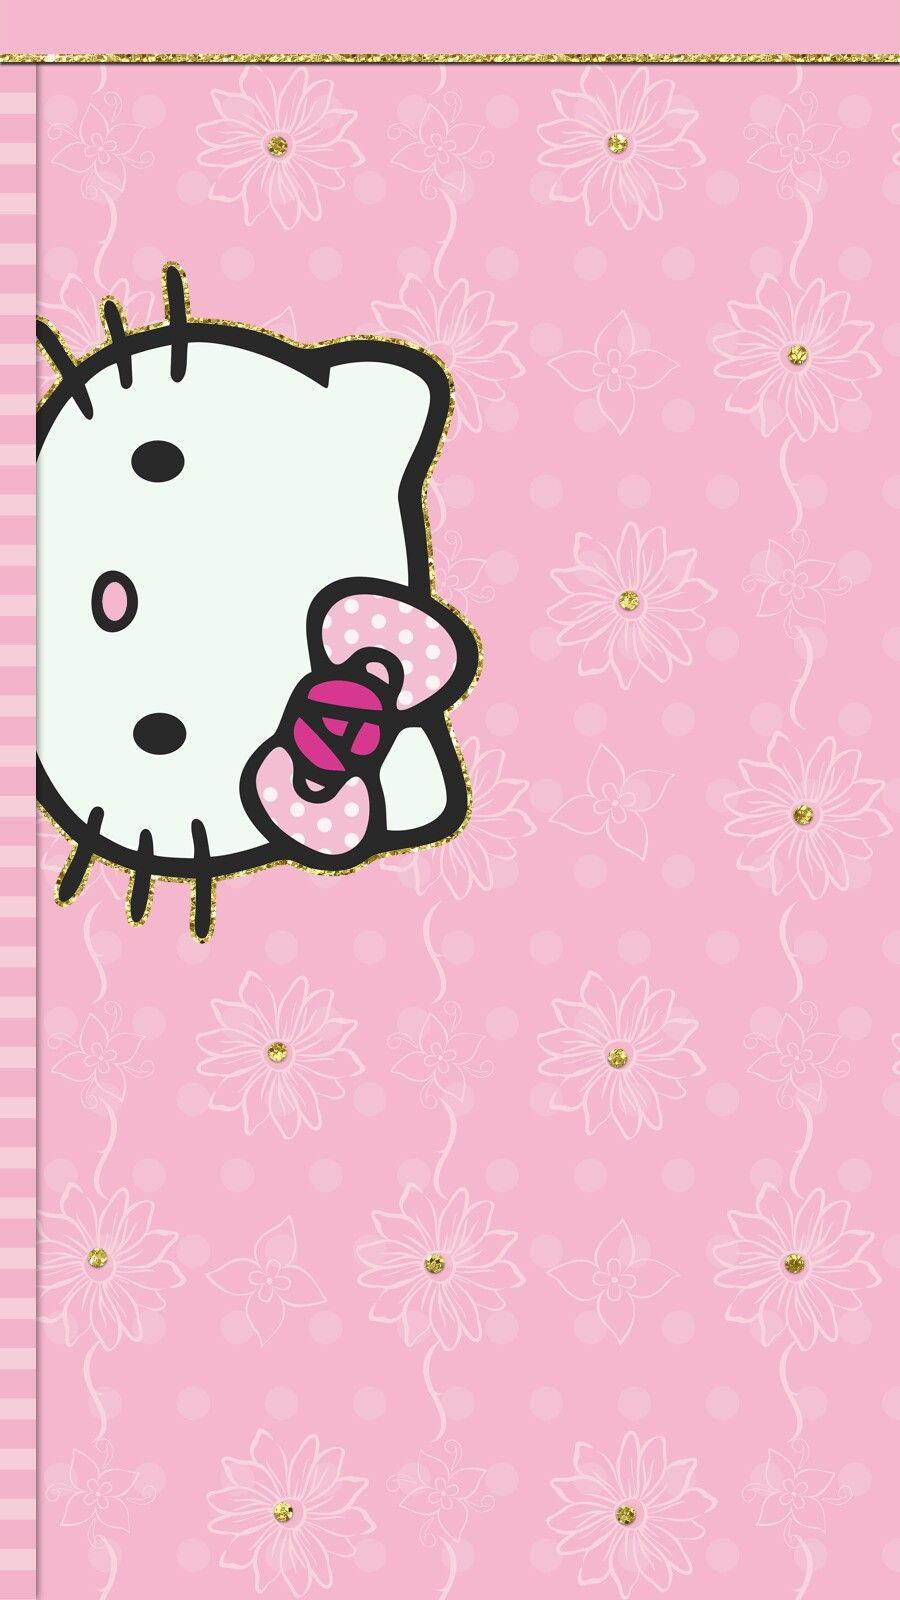 Popular Wallpaper Hello Kitty Apple - ba6e847d204cbb1698c916eaaa4fbf9b  Graphic_457442.jpg